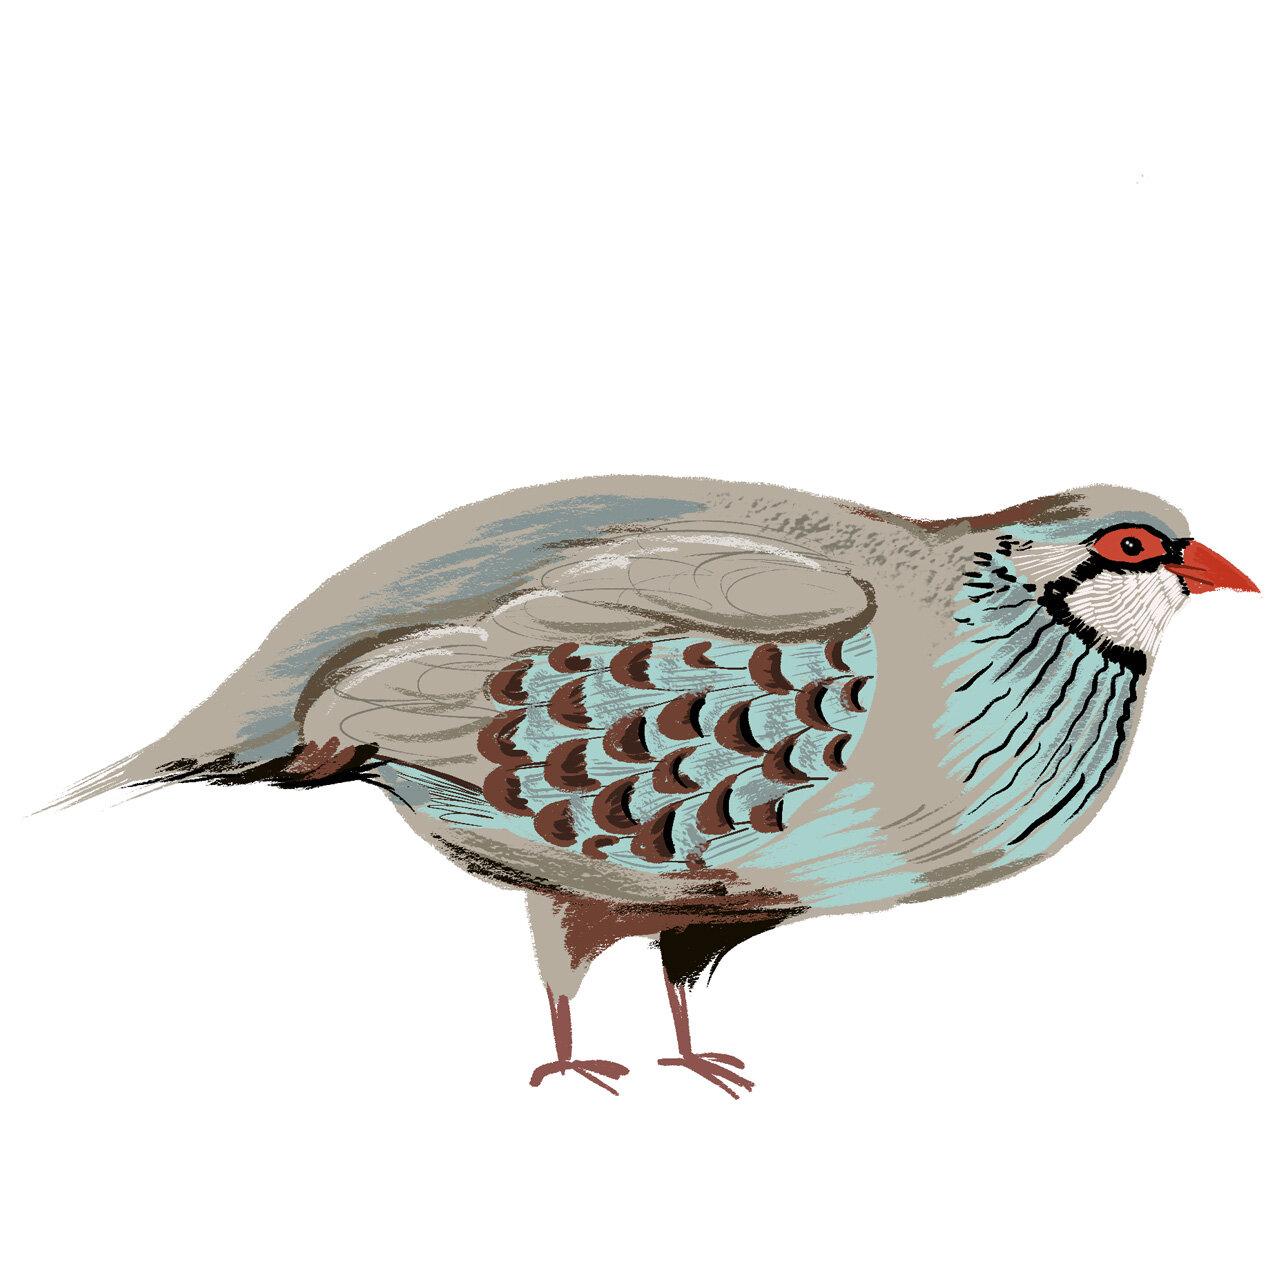 Partridge Illustration - Animal & Pet Illustration